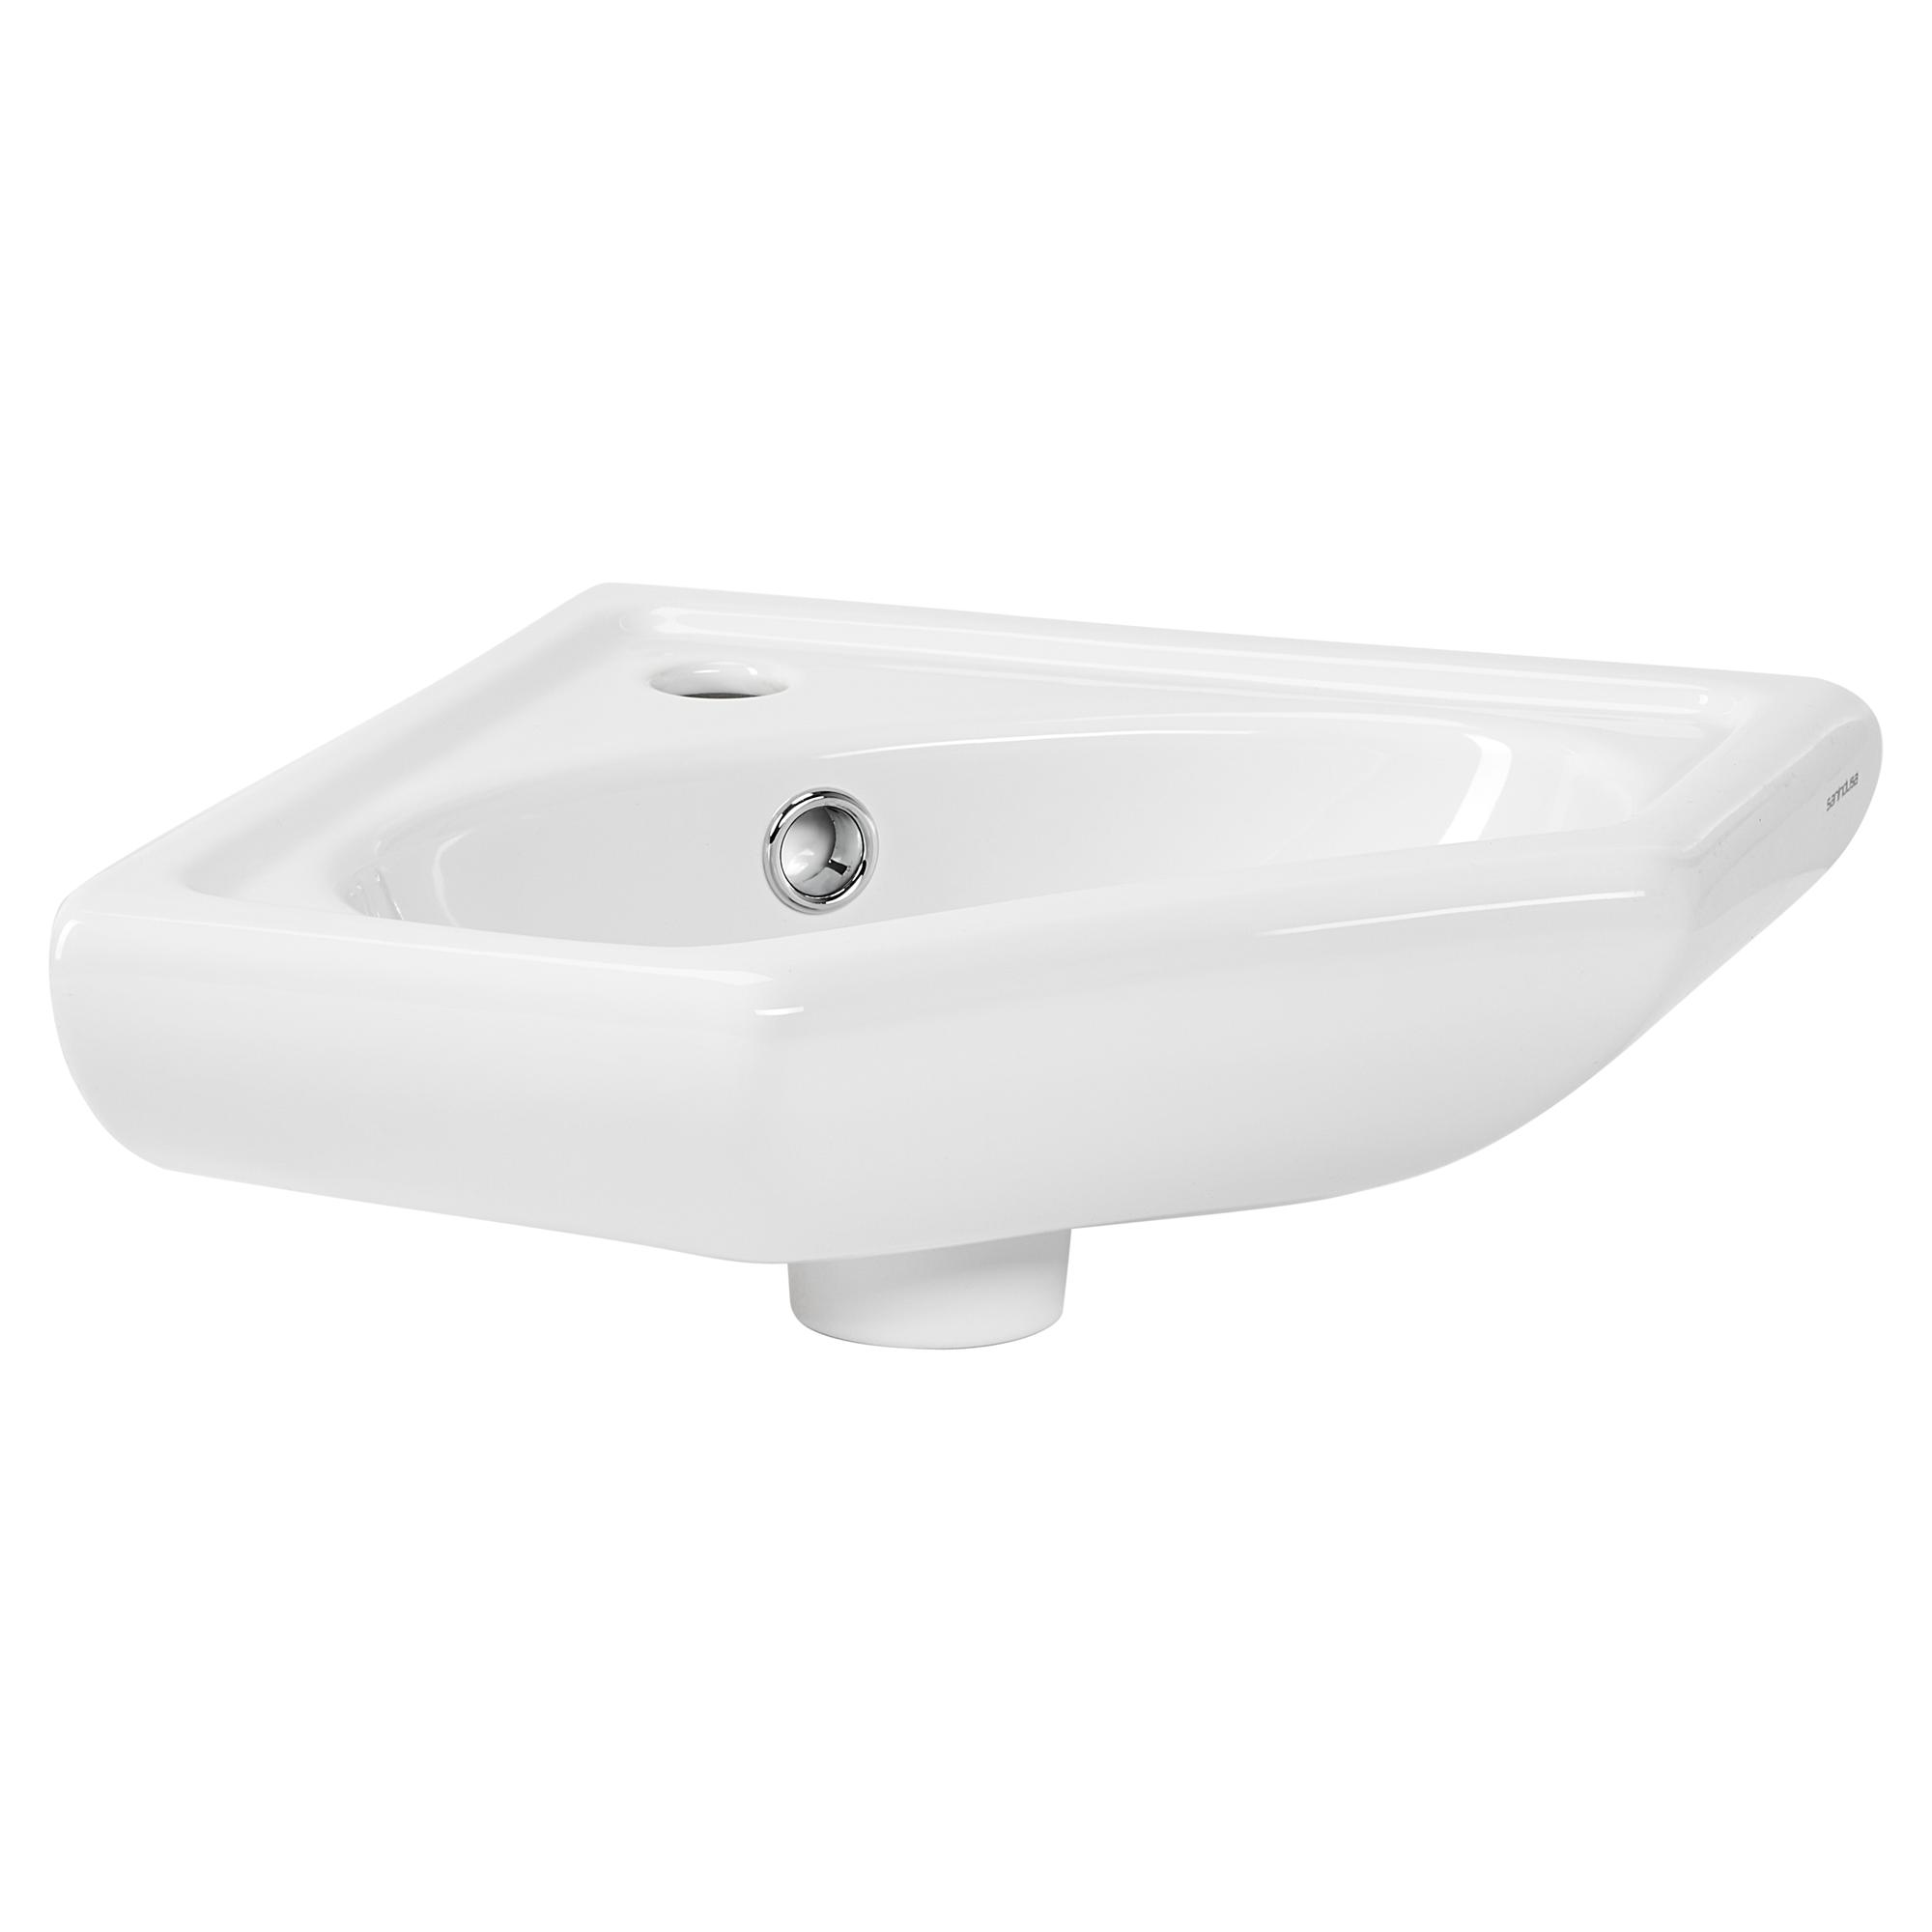 "Eck Handwaschbecken ""Scalma"" Keramik weiß 34 cm ǀ toom"